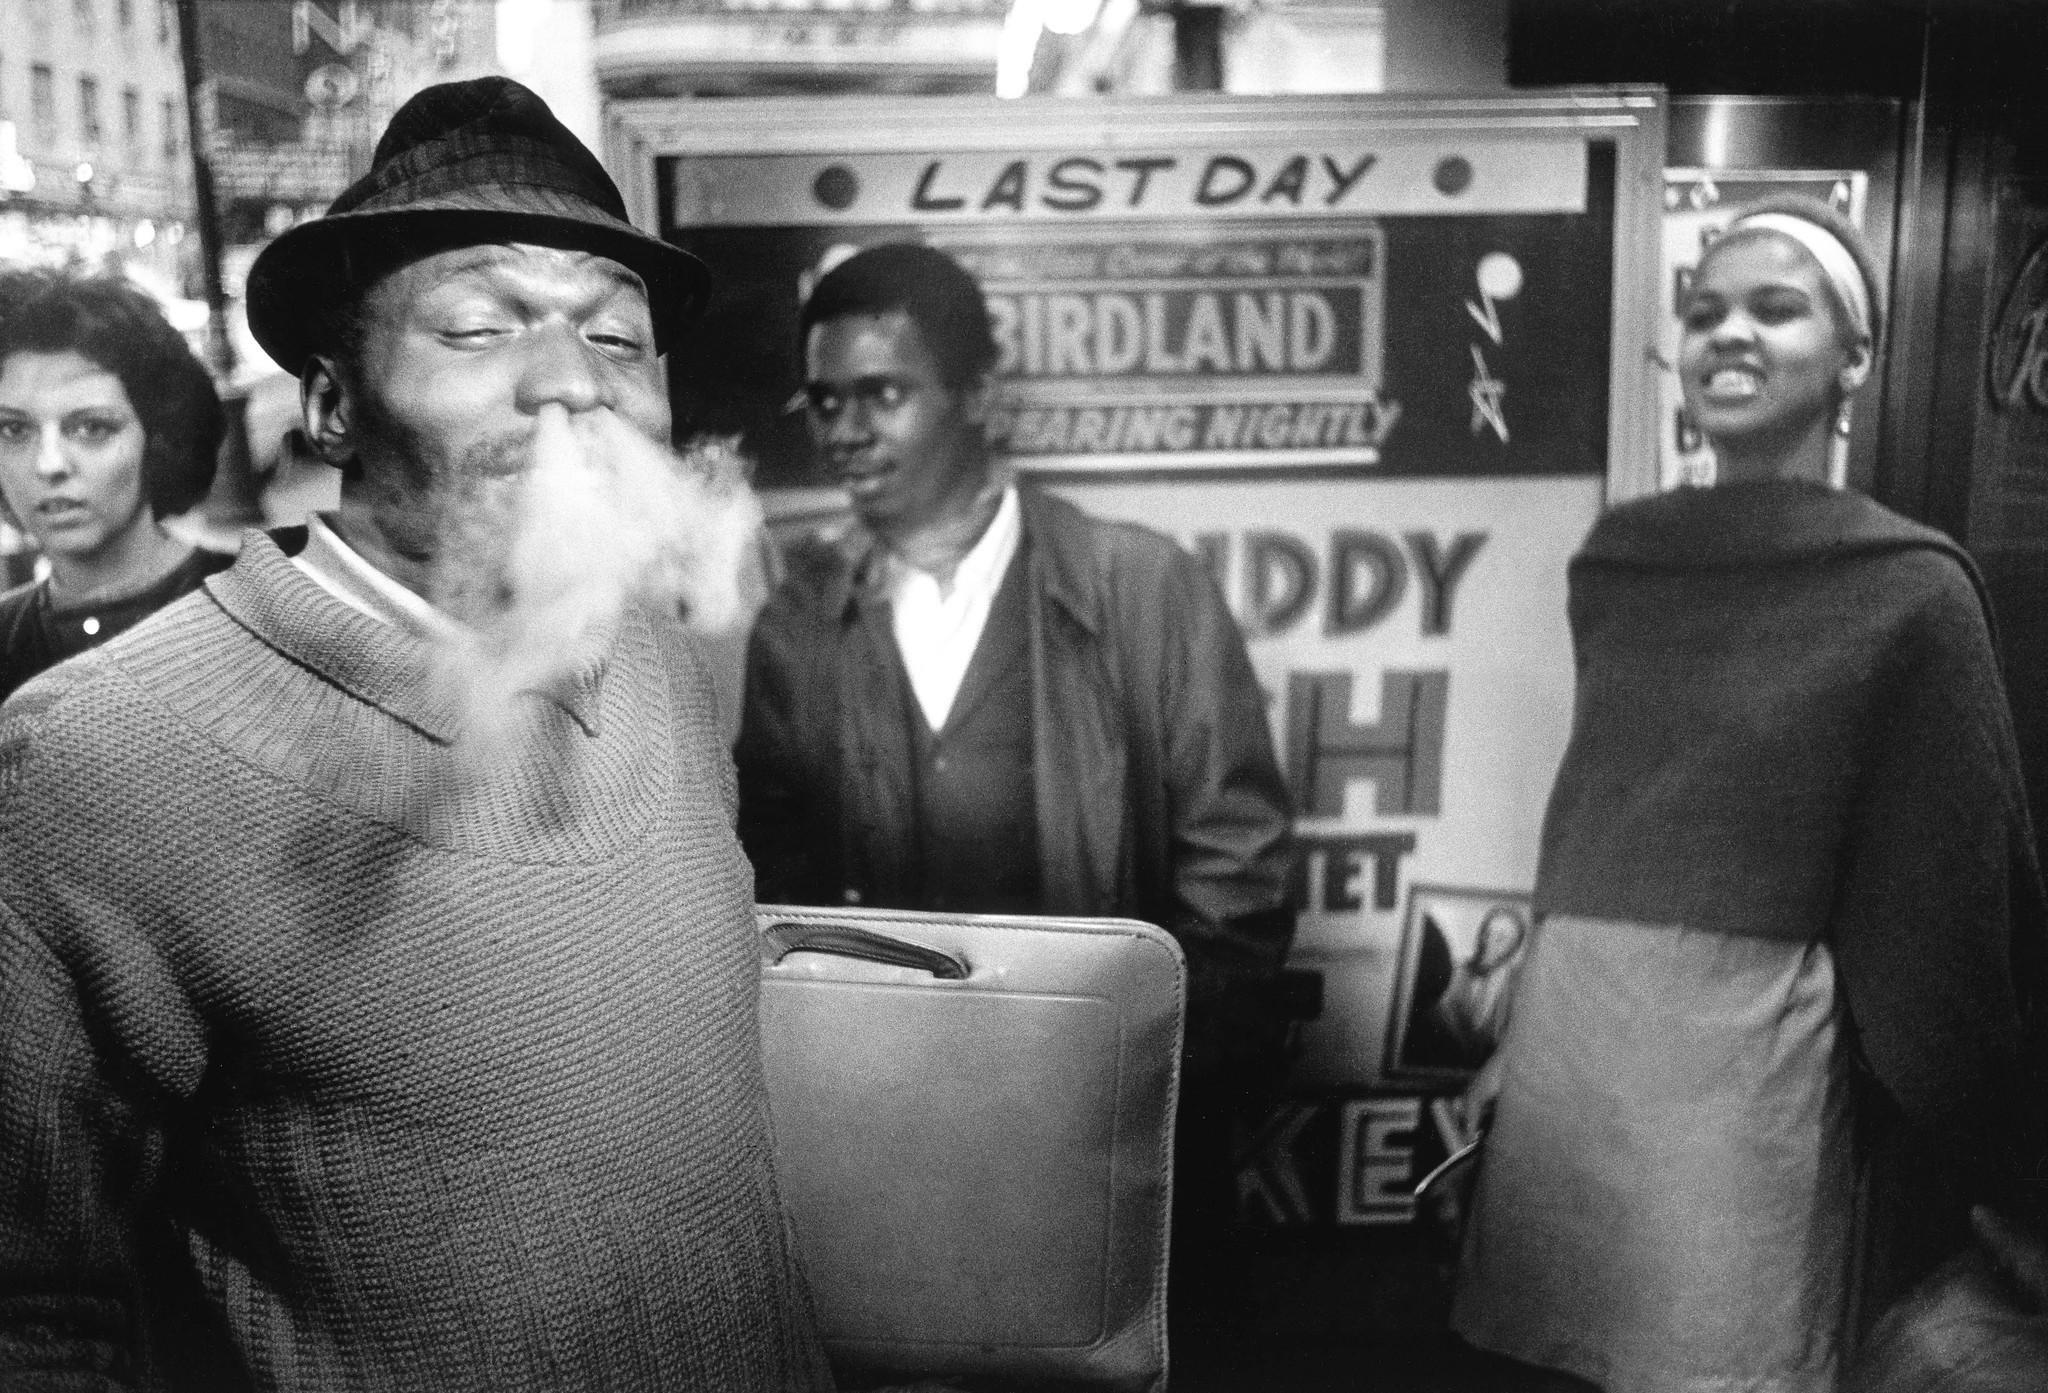 'Jazzlife' brings William Claxton's stunning photos back